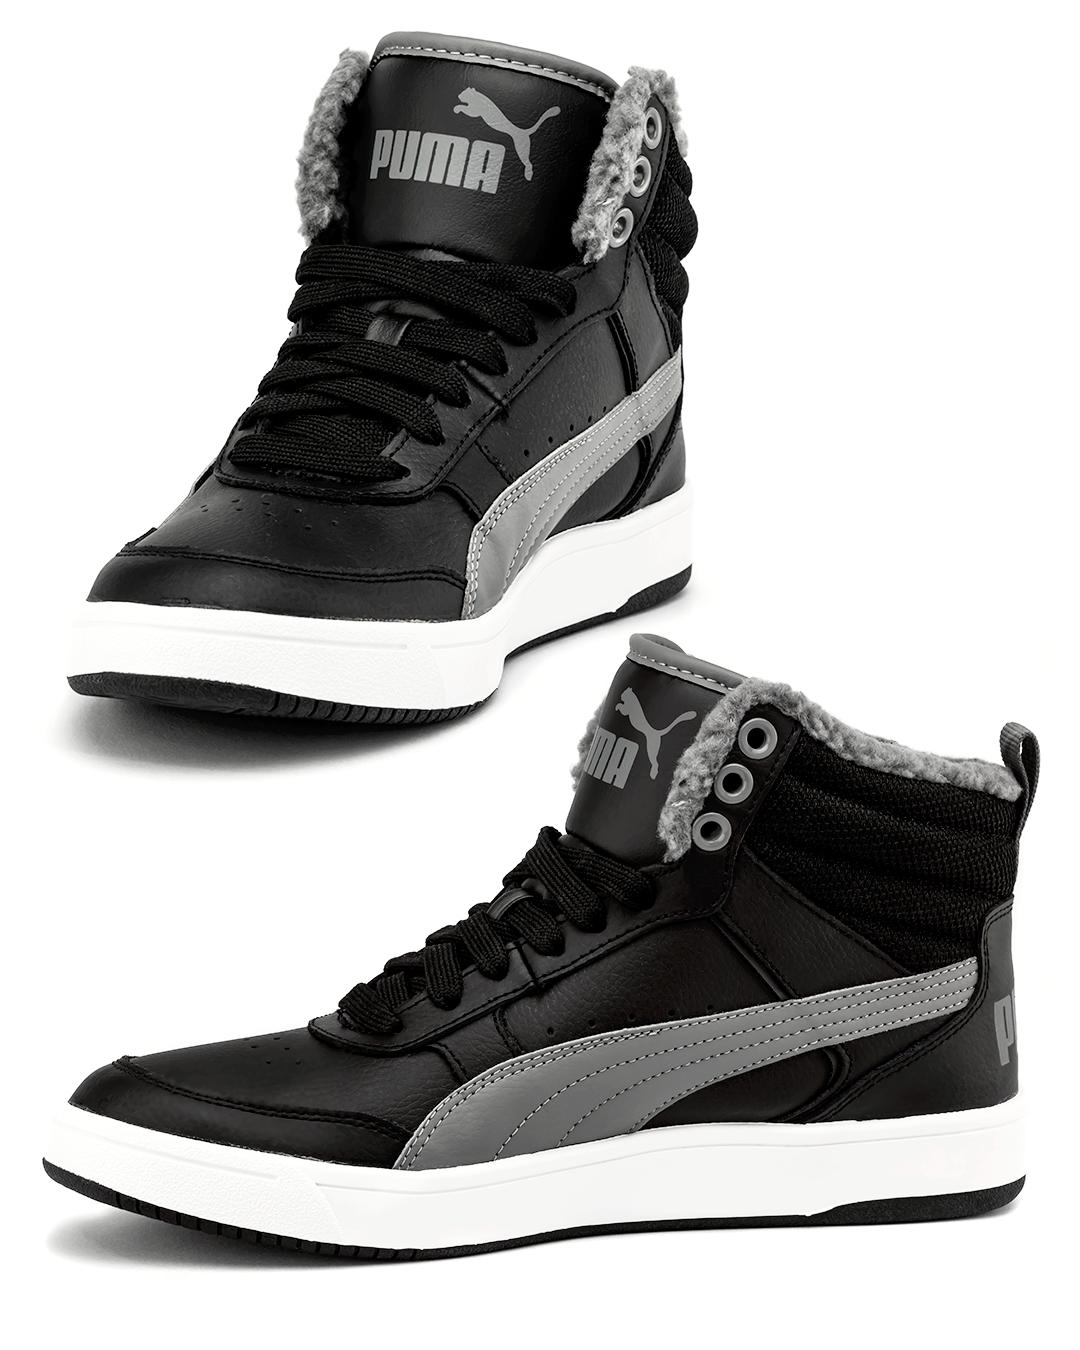 puma-botas-zapatillas-sneakers-ecommerce-amazom-photoshoot-commercial-product-photo-fotografia-producto-fotografo-Sr-Erreka-films-photo-spain-costa-del-sol-malaga-madrid.png